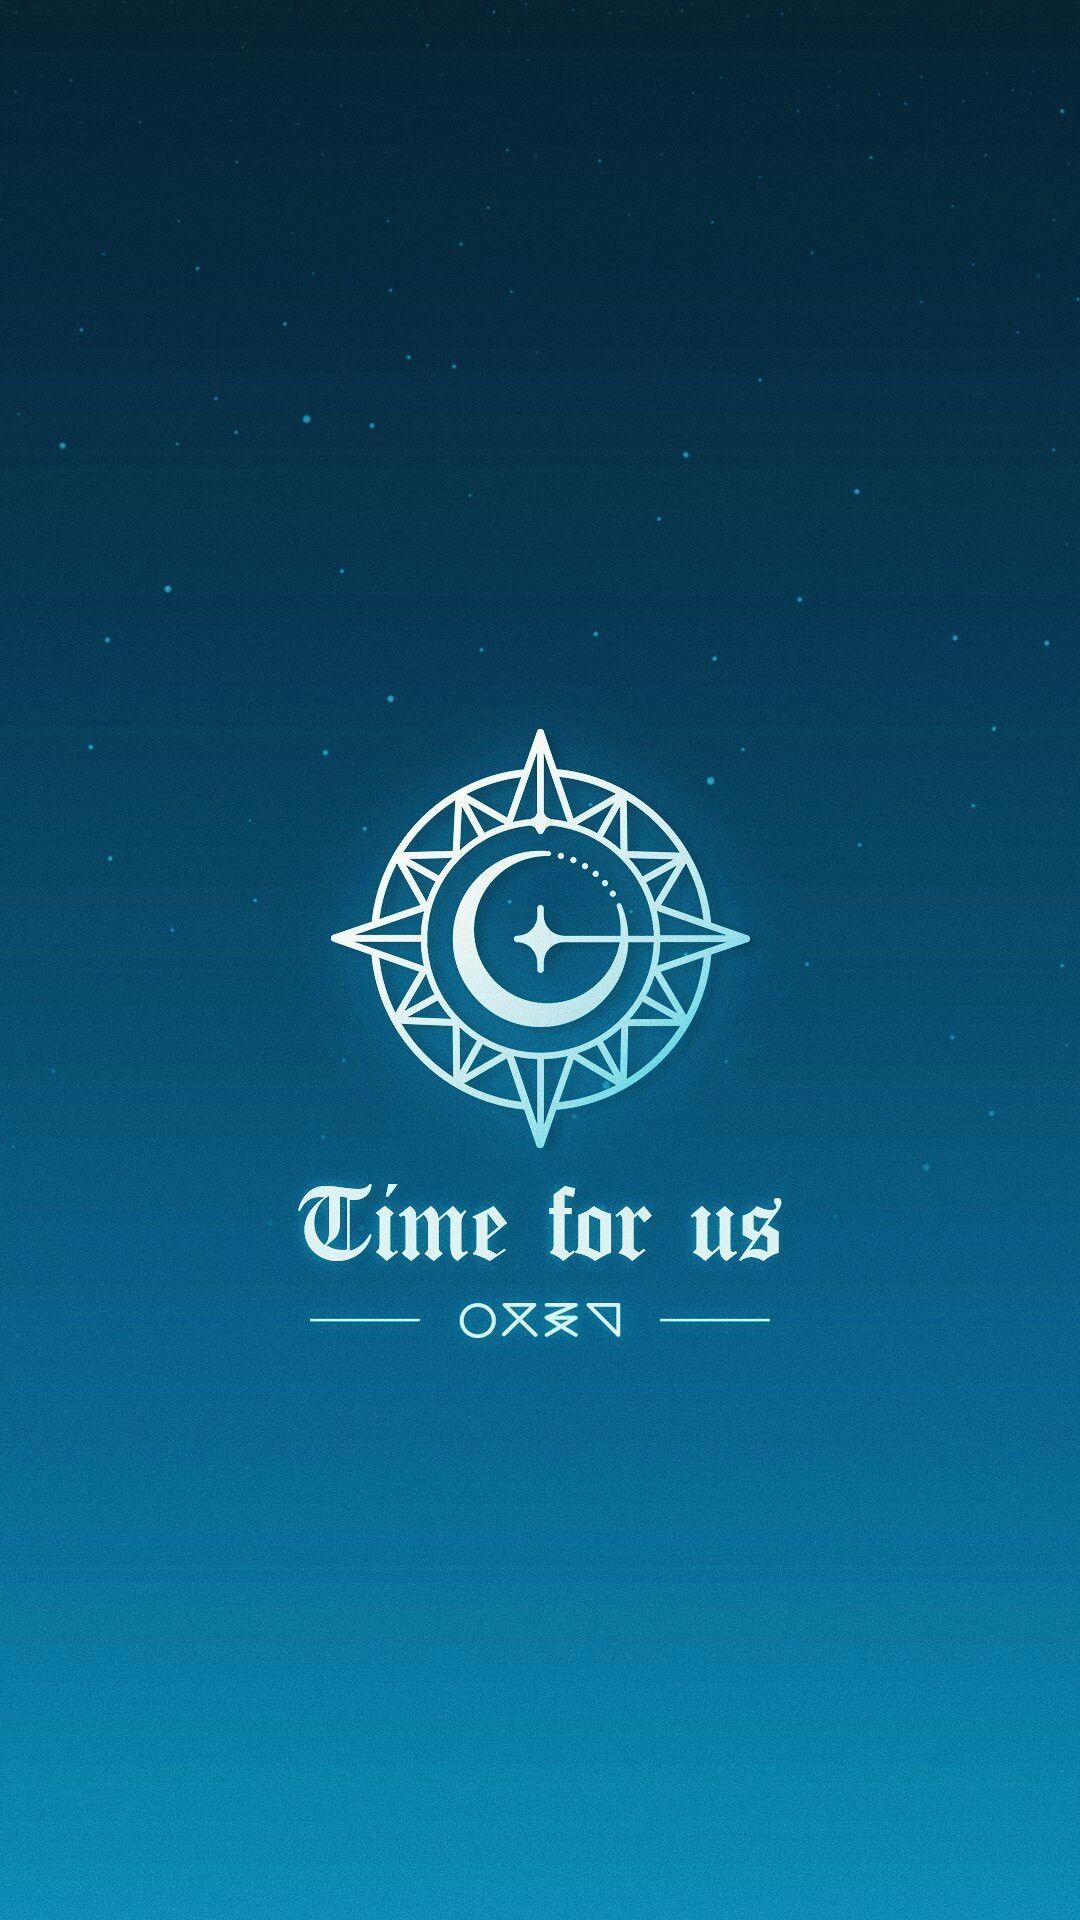 Pin By Snow Fuchsia On Gfriend 여자친구 Story Kpop Logos Sunrise Wallpaper Lock Screen Wallpaper